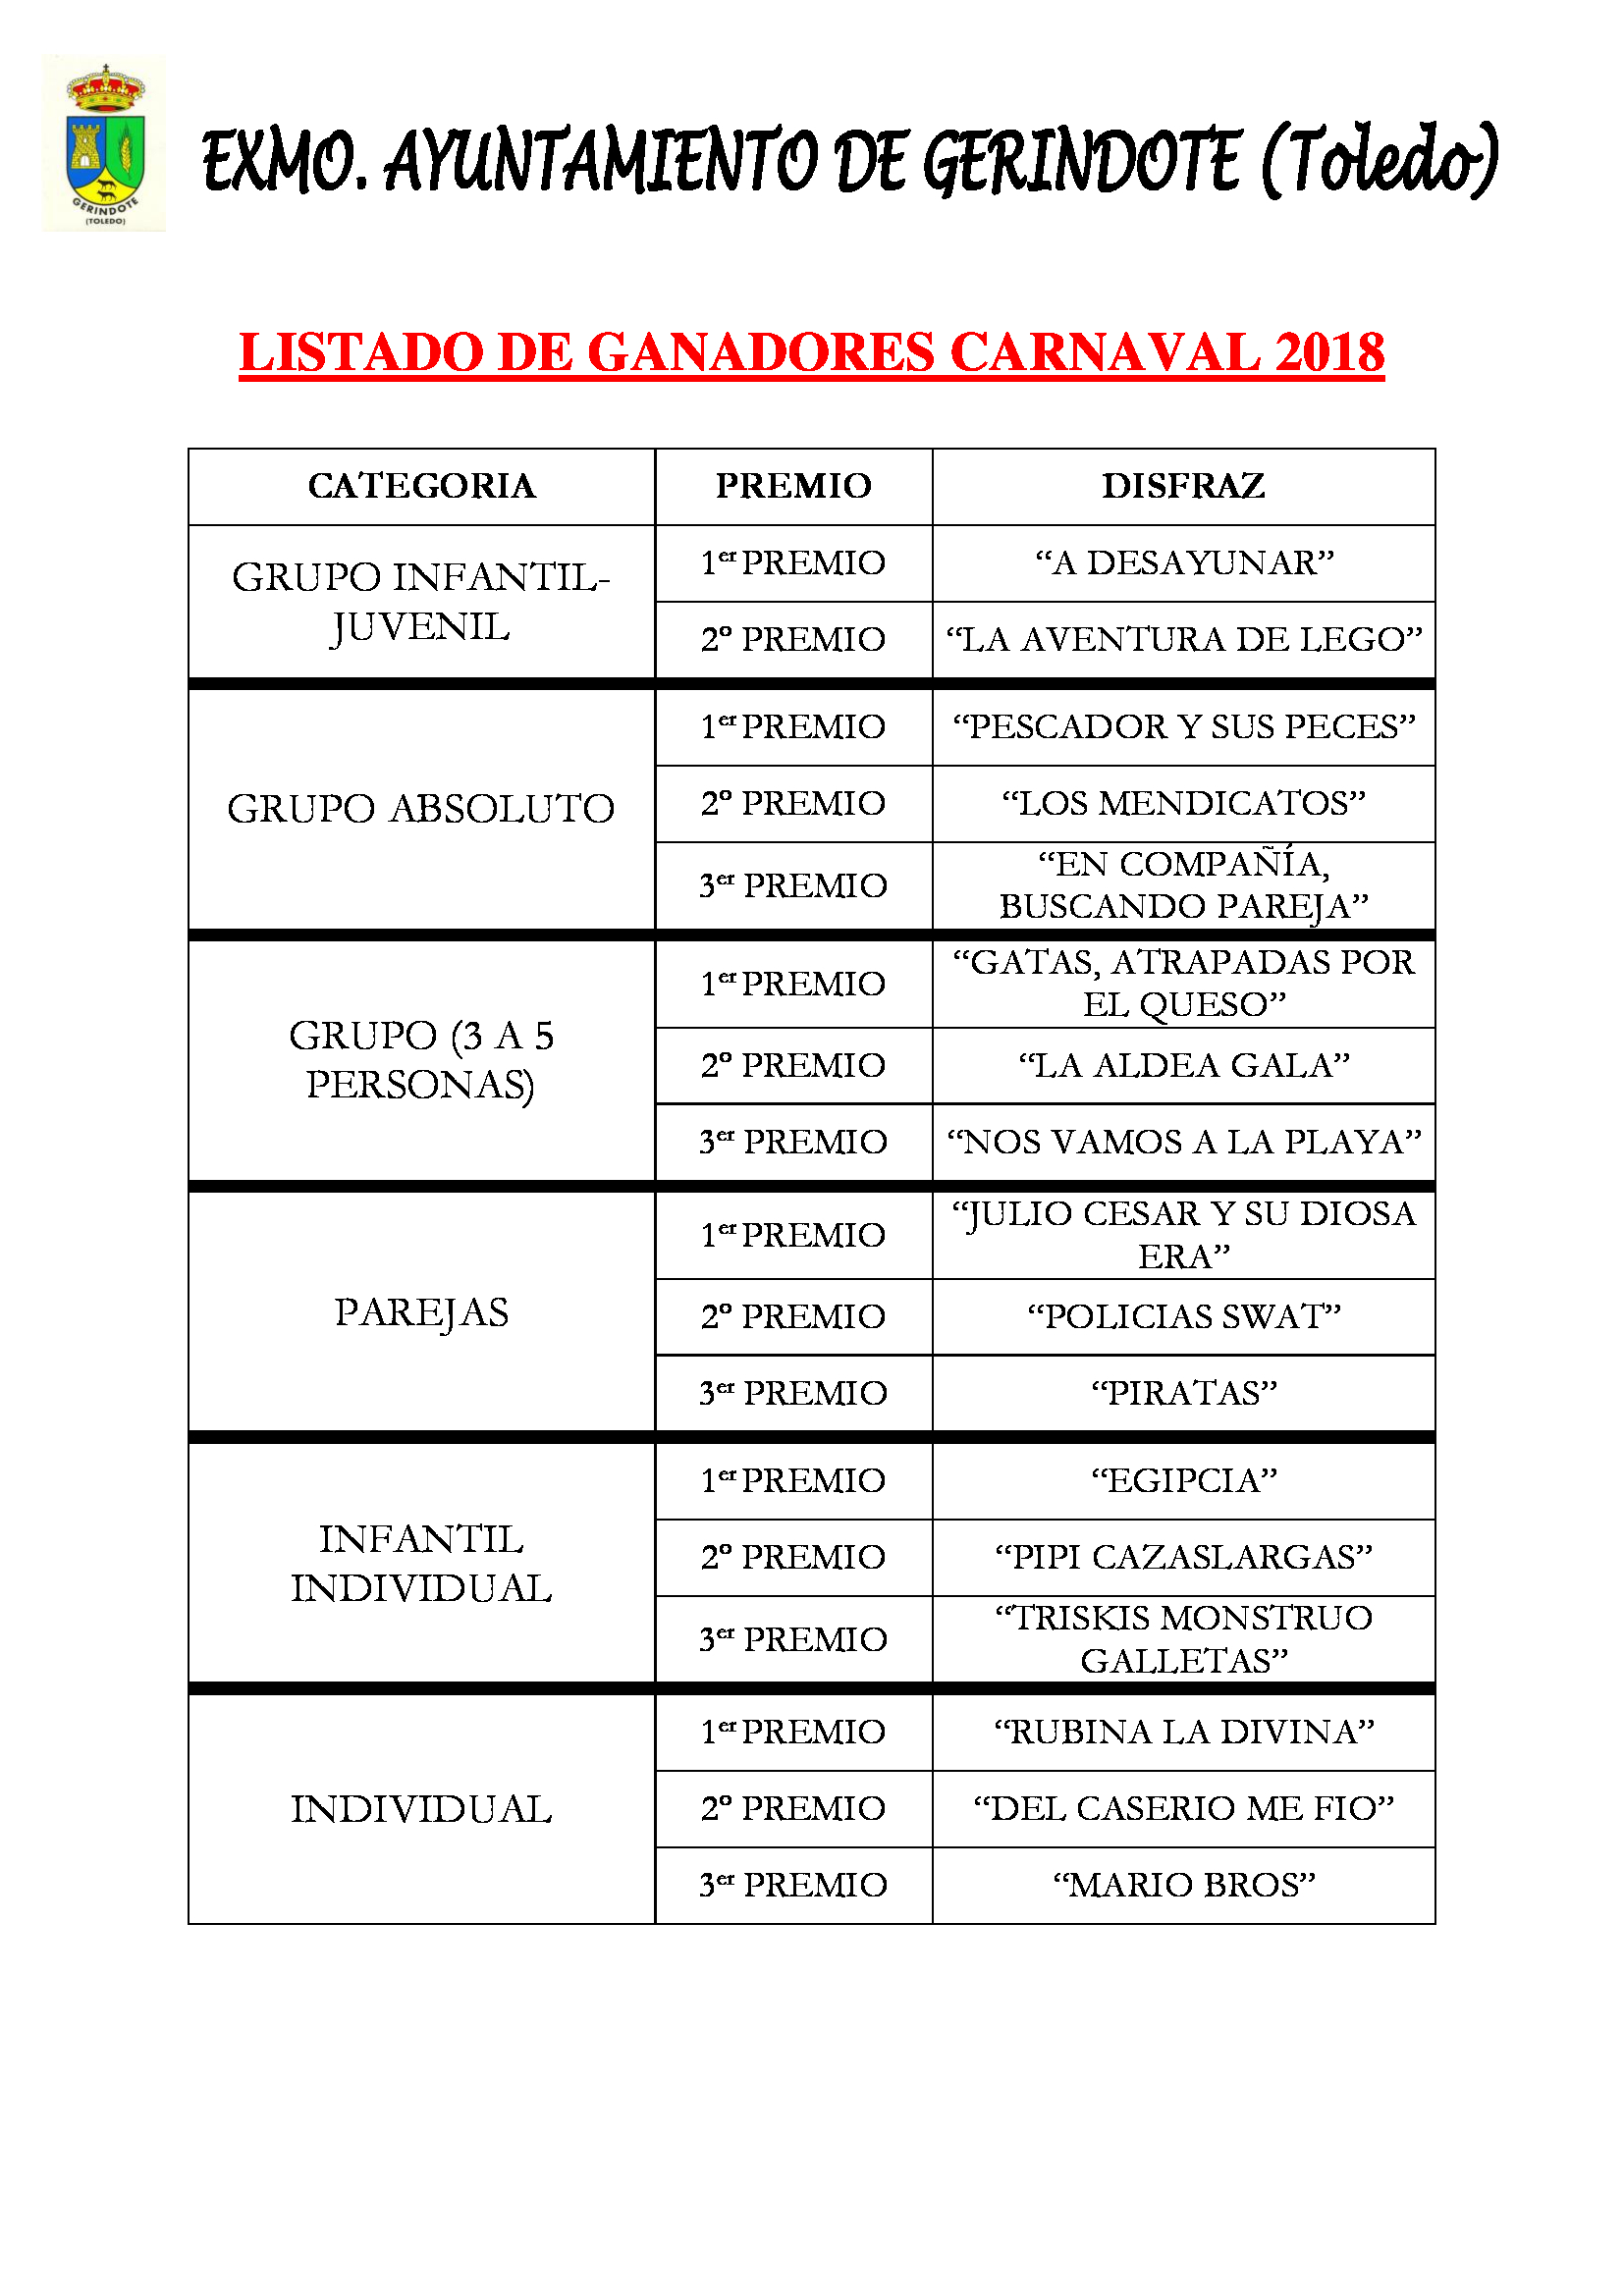 LISTADO-GANADORES.jpg